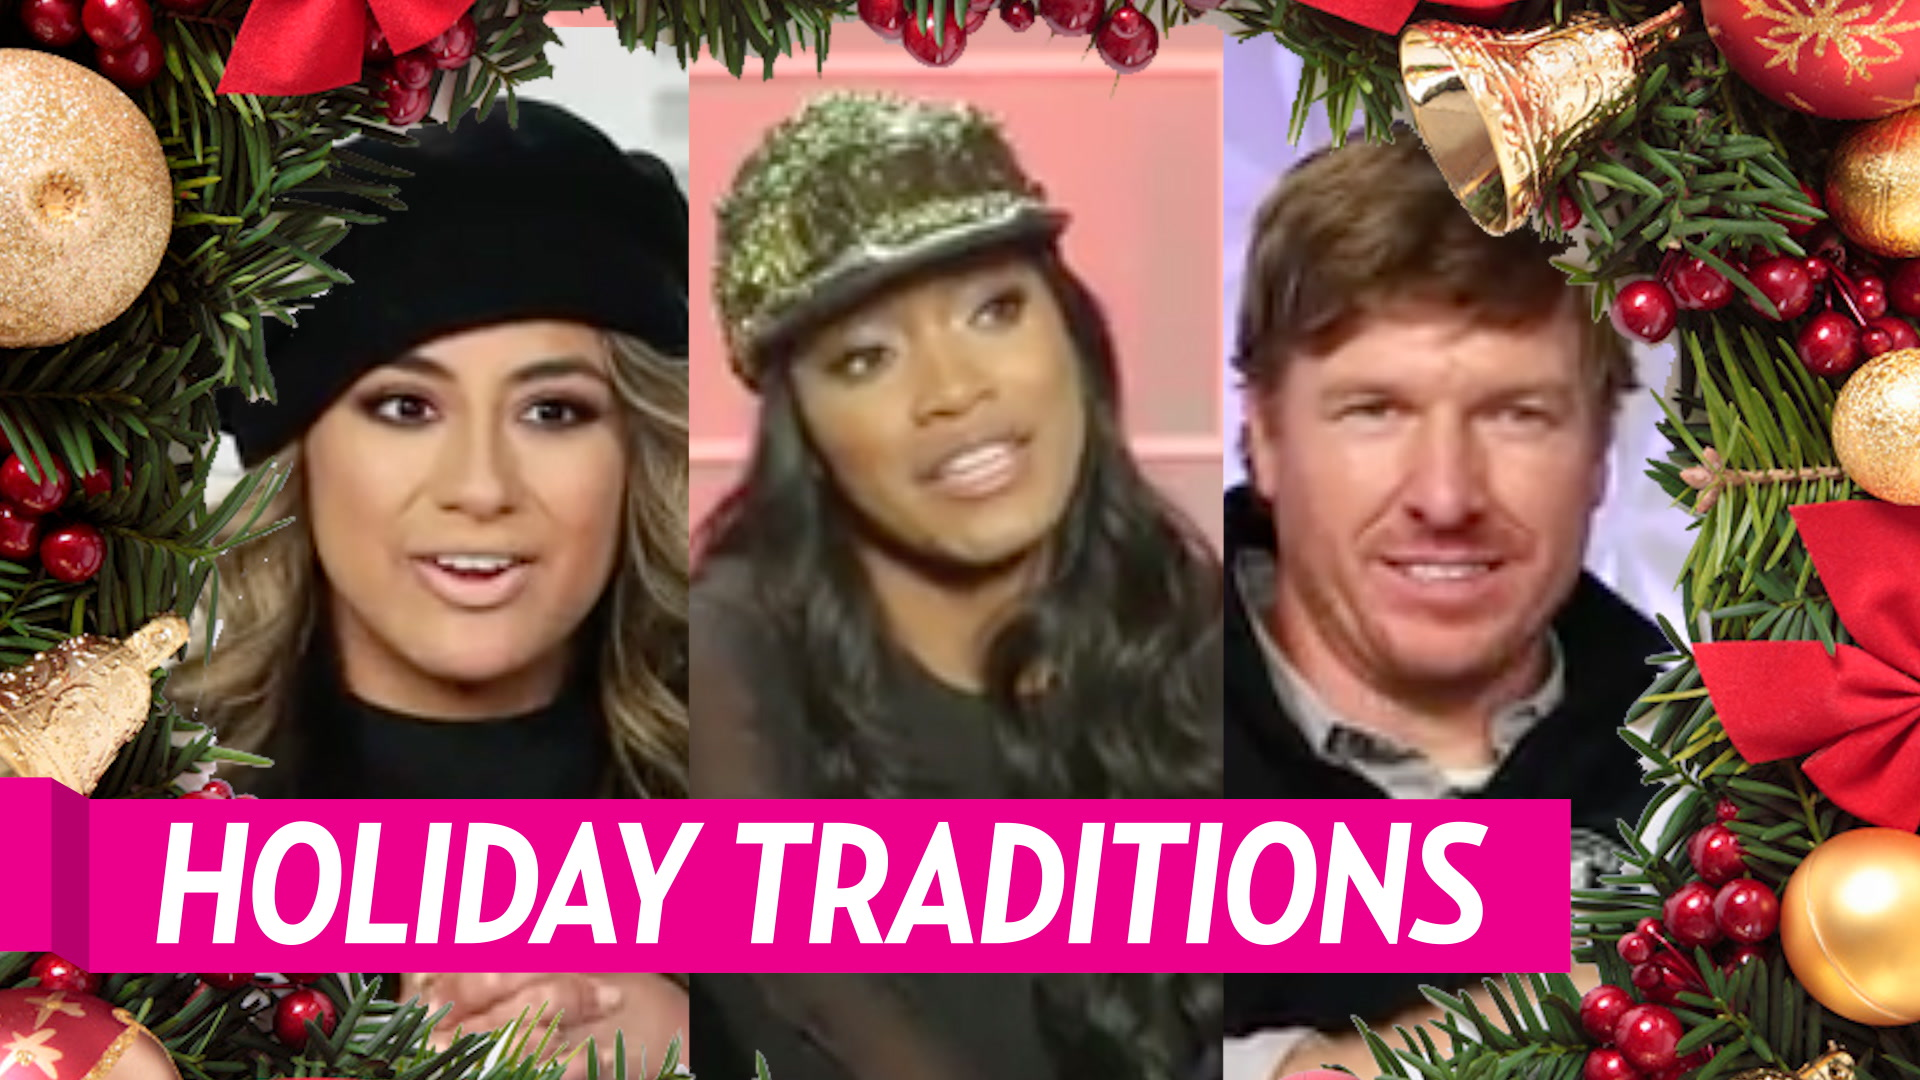 Khloe Kardashian Shows f Christmas Gifts From Kris Jenner